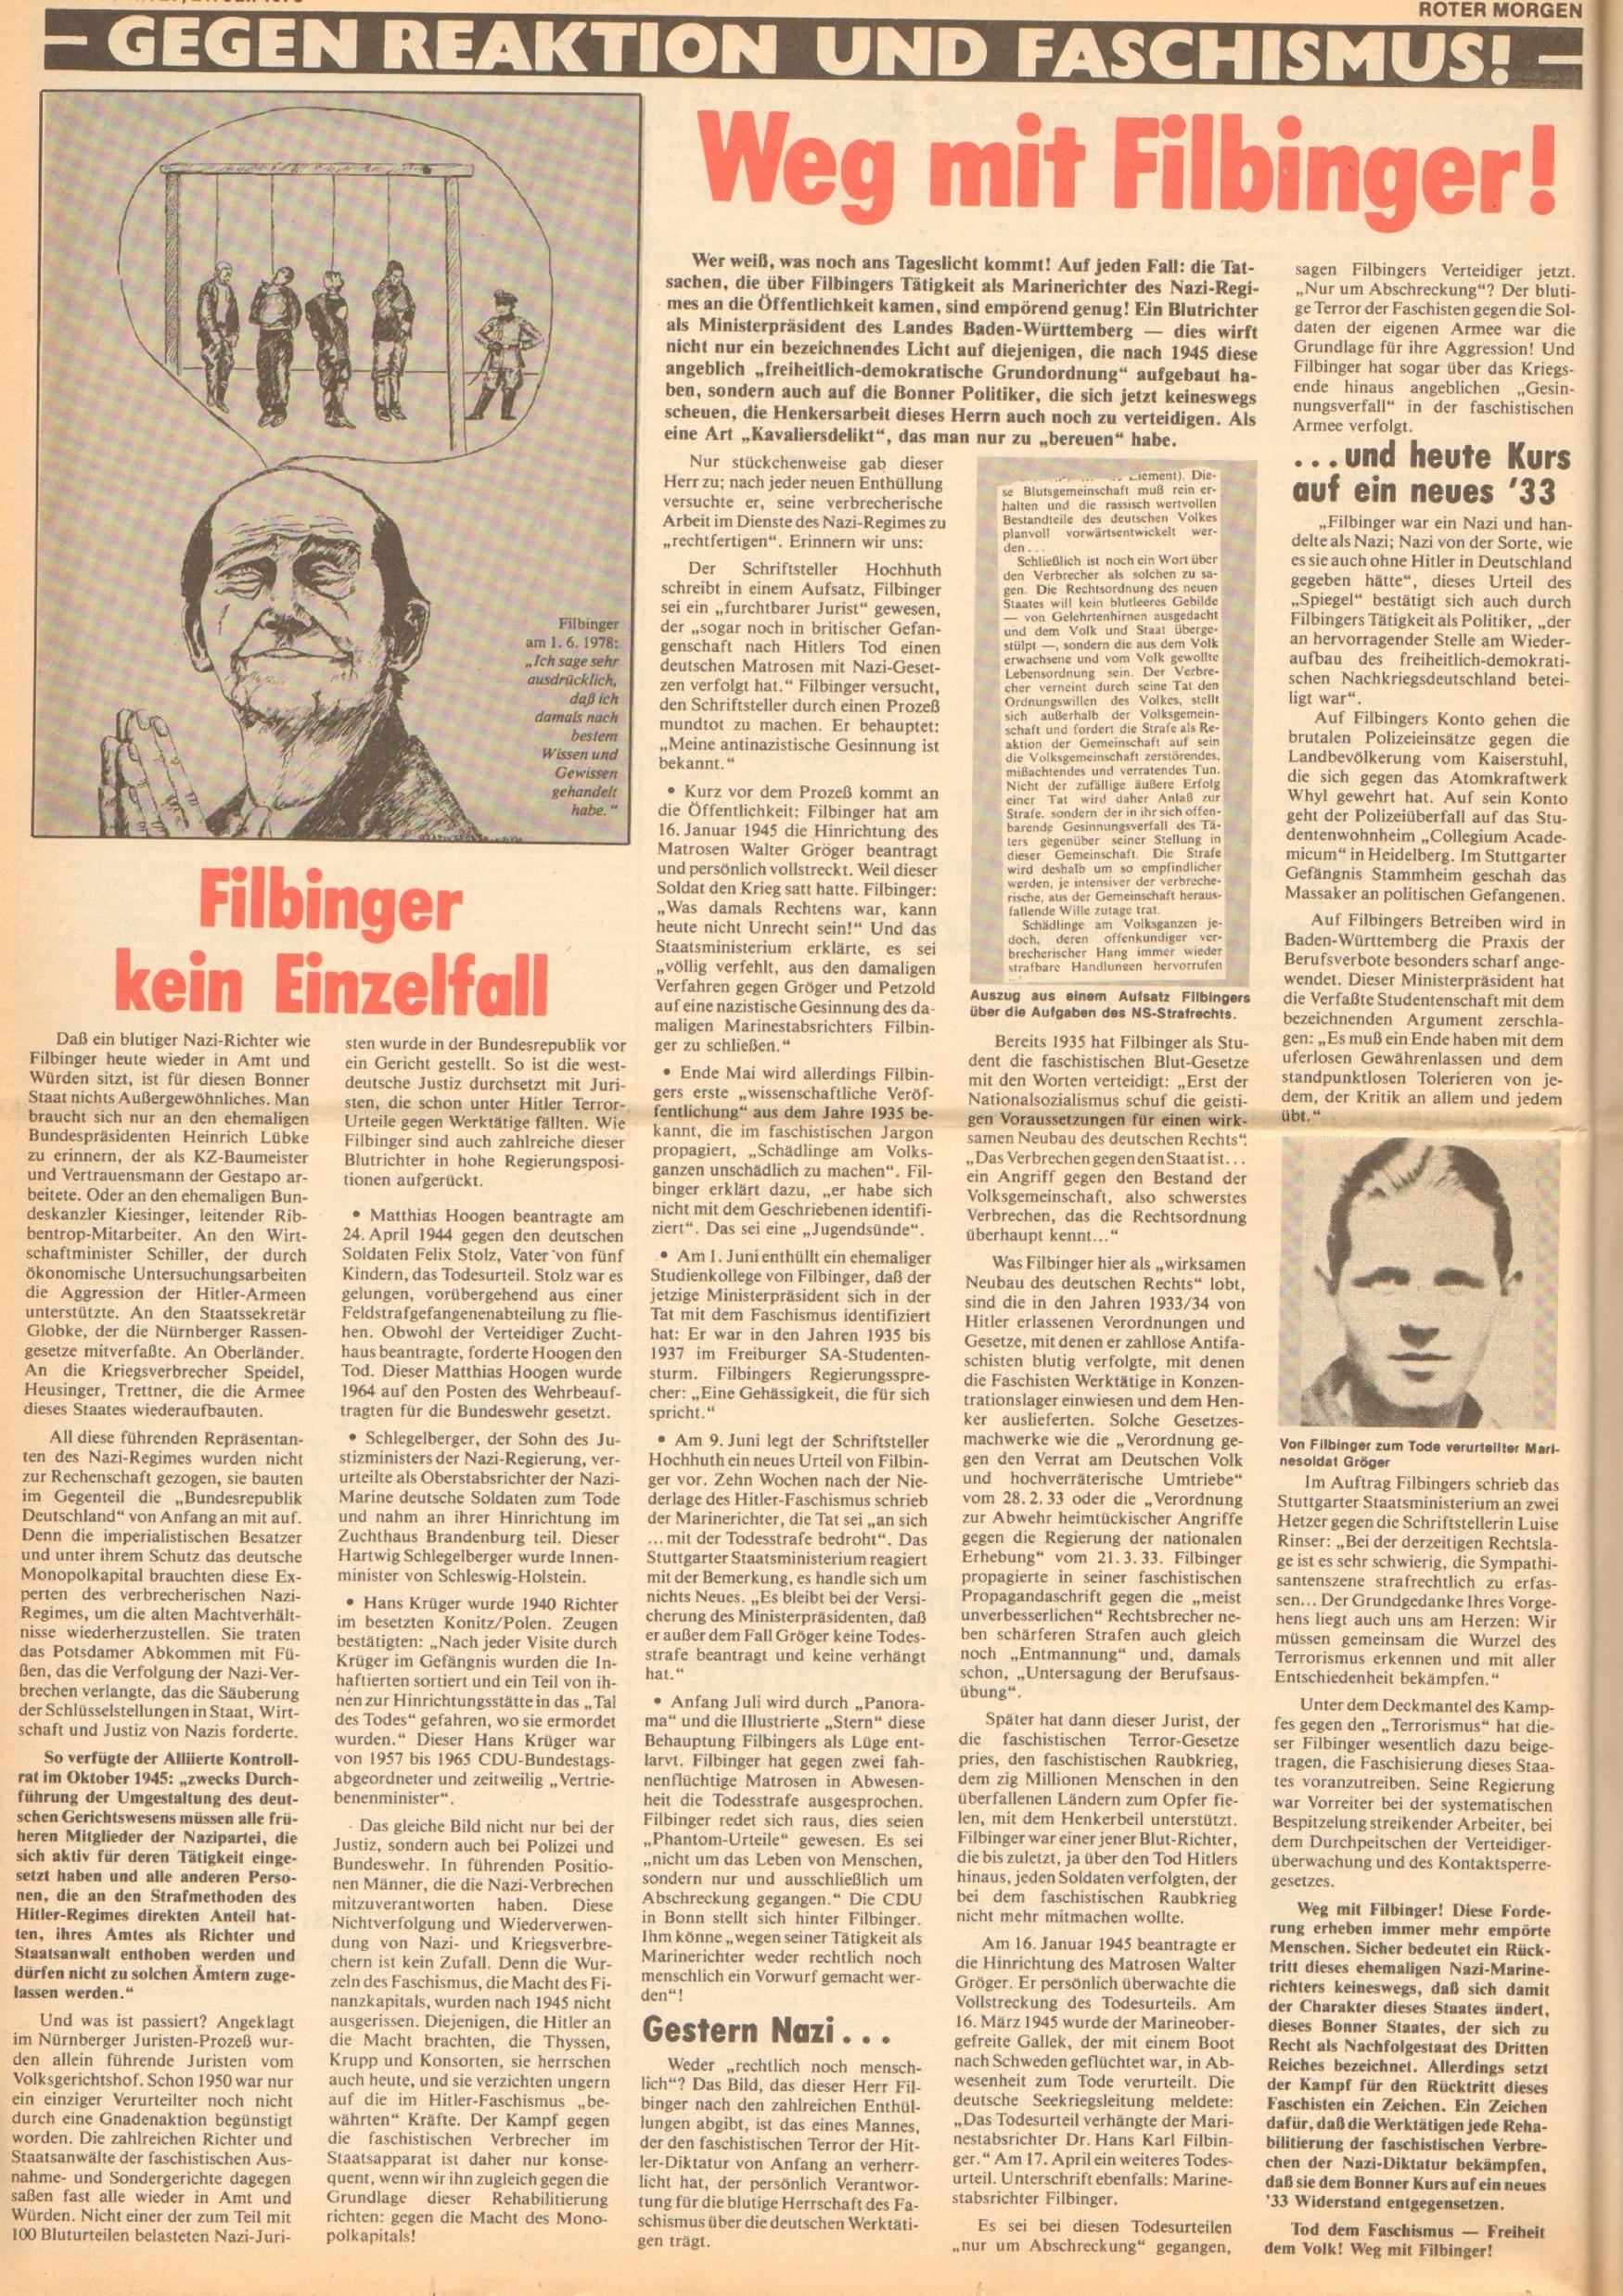 Roter Morgen, 12. Jg., 21. Juli 1978, Nr. 29, Seite 6